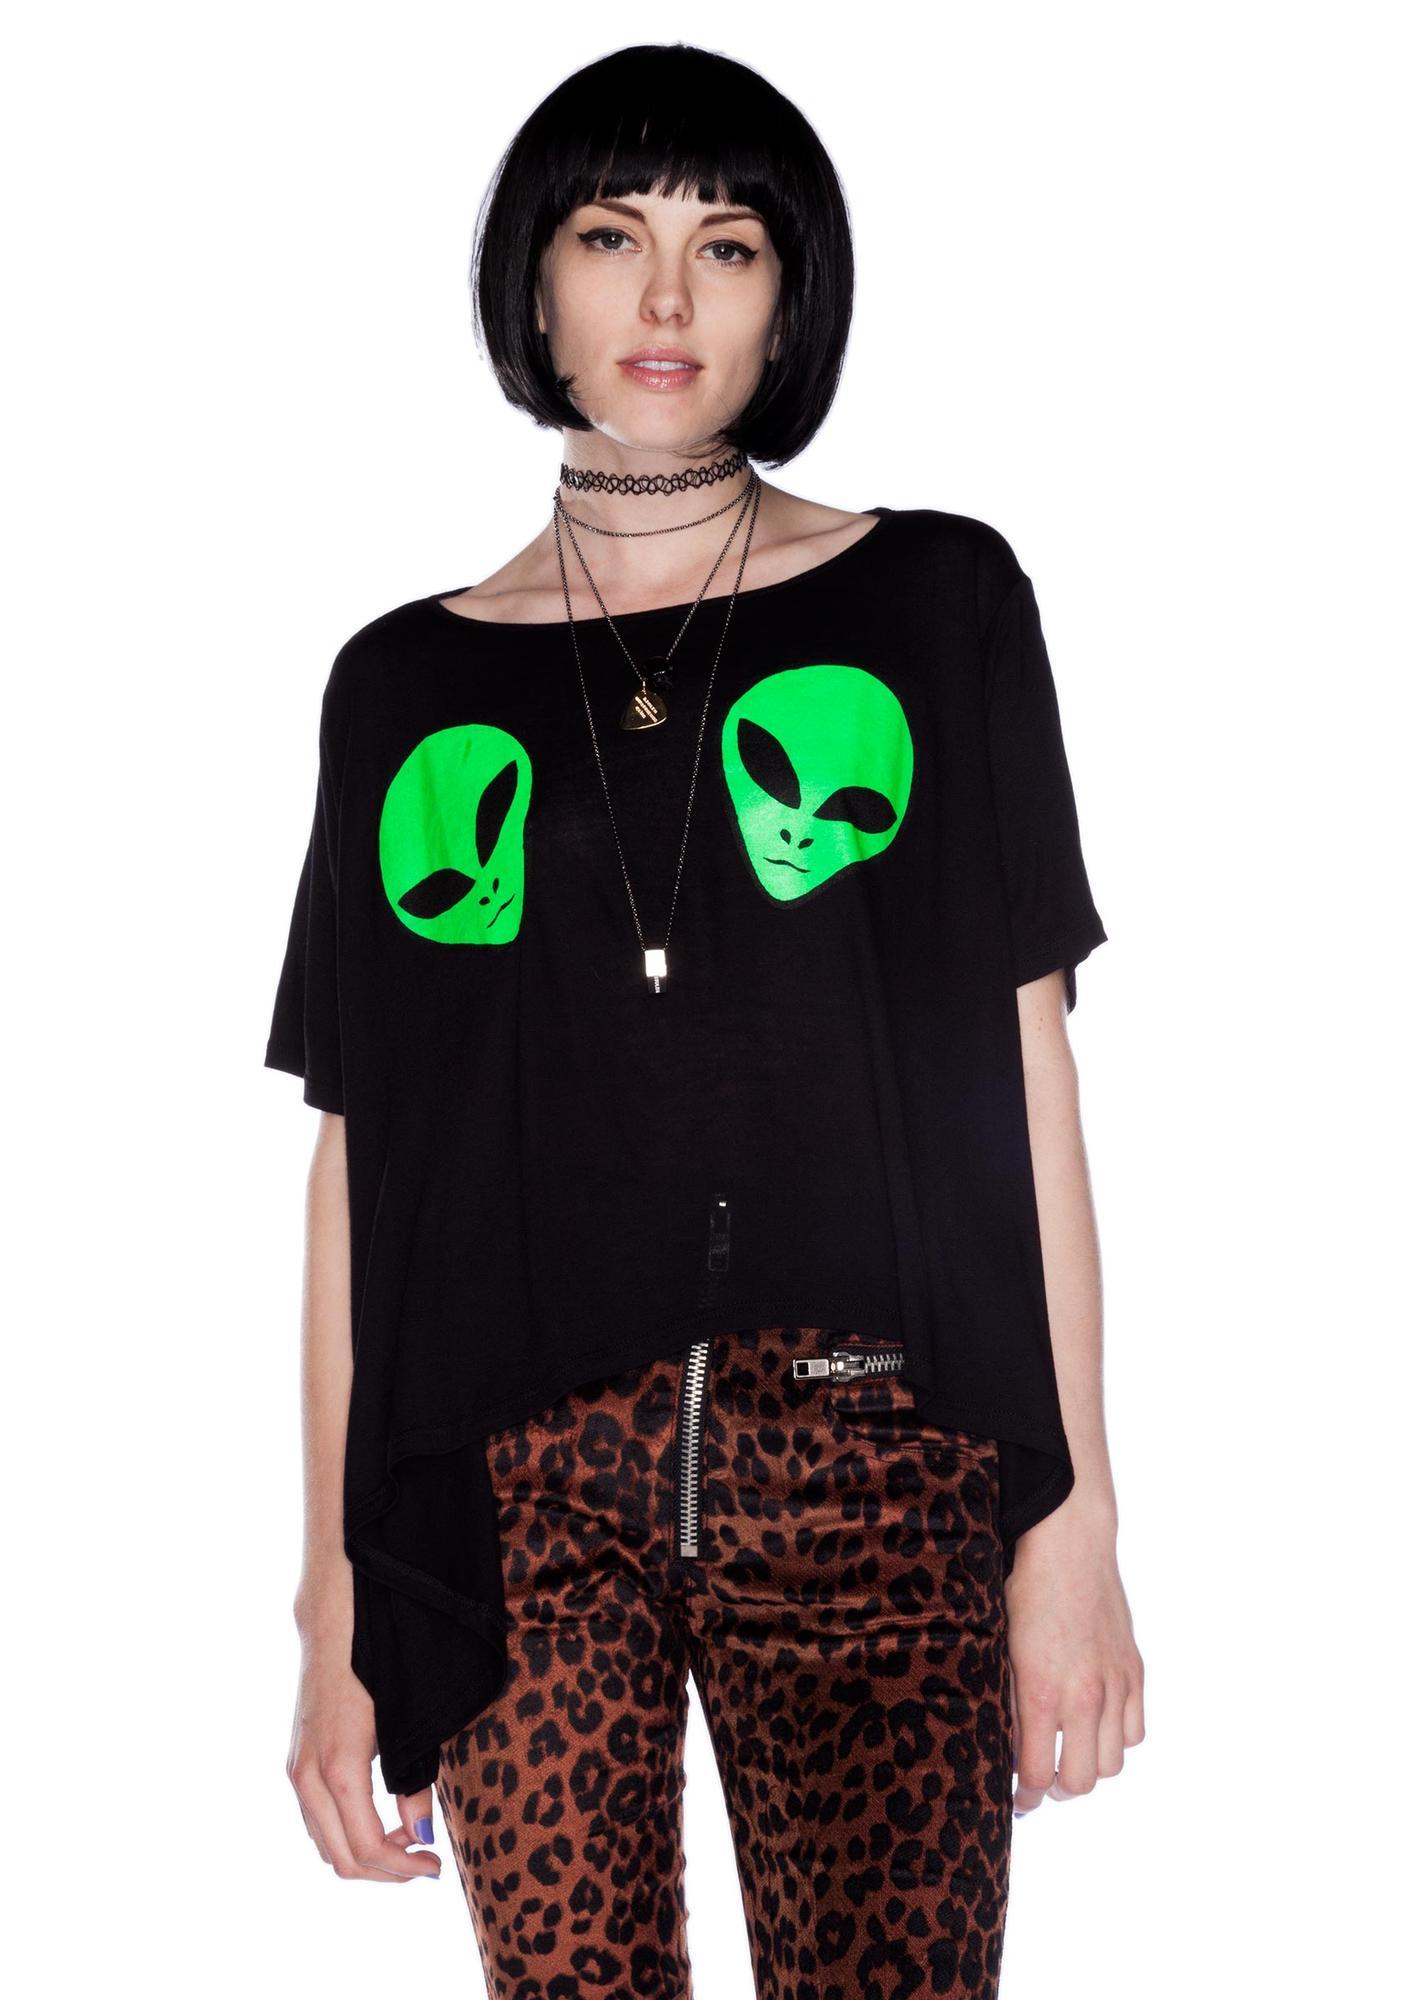 UNIF Alien Boobs Tee